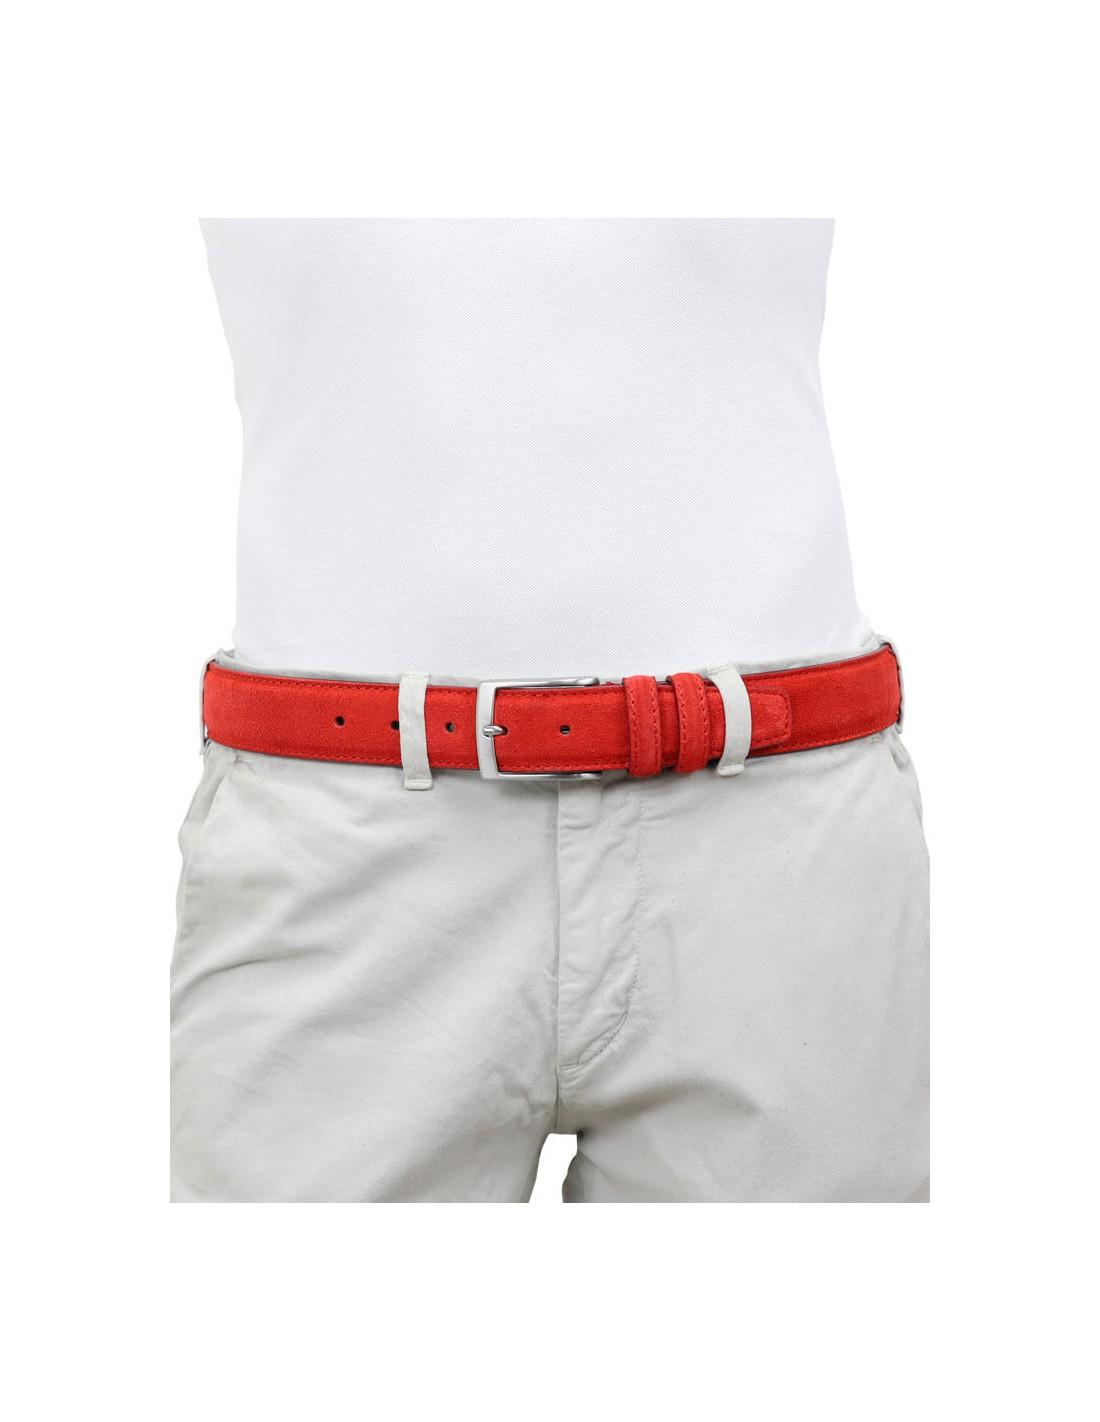 nuovo arrivo eef27 6d1ce Cintura uomo rossa in camoscio artigianale made in Italy